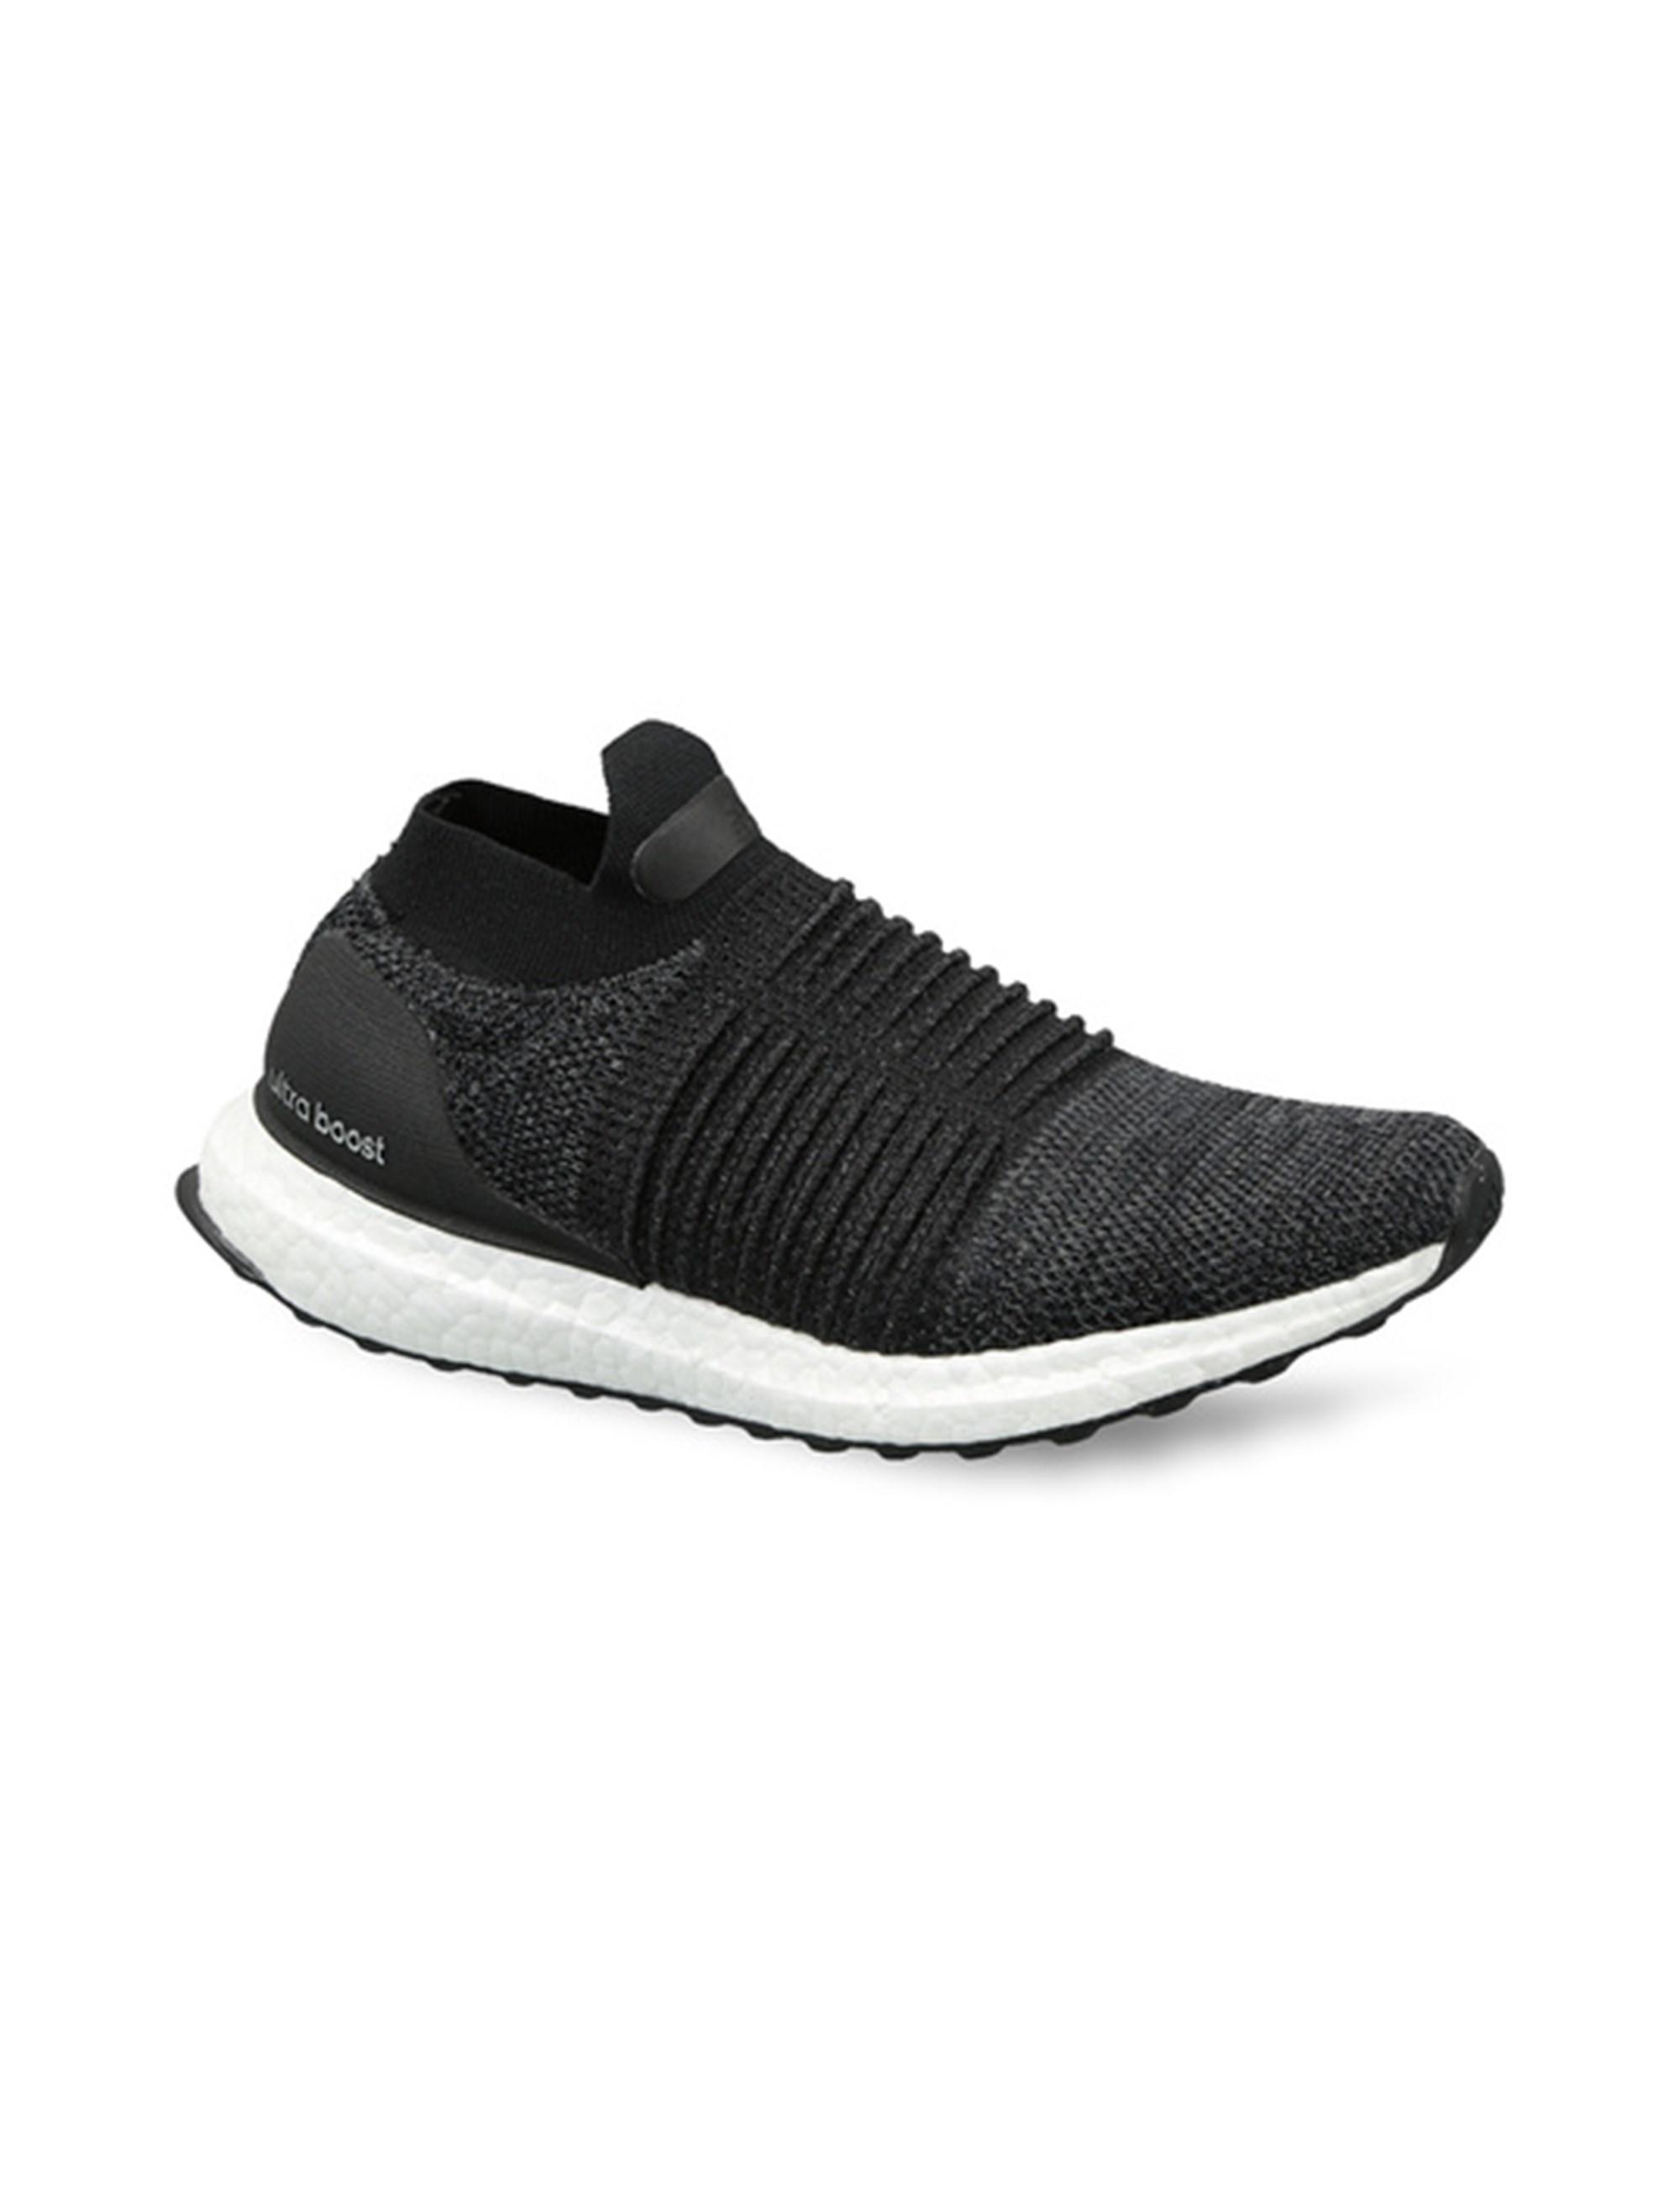 کفش مخصوص دویدن زنانه آدیداس مدل Ultraboost Laceless